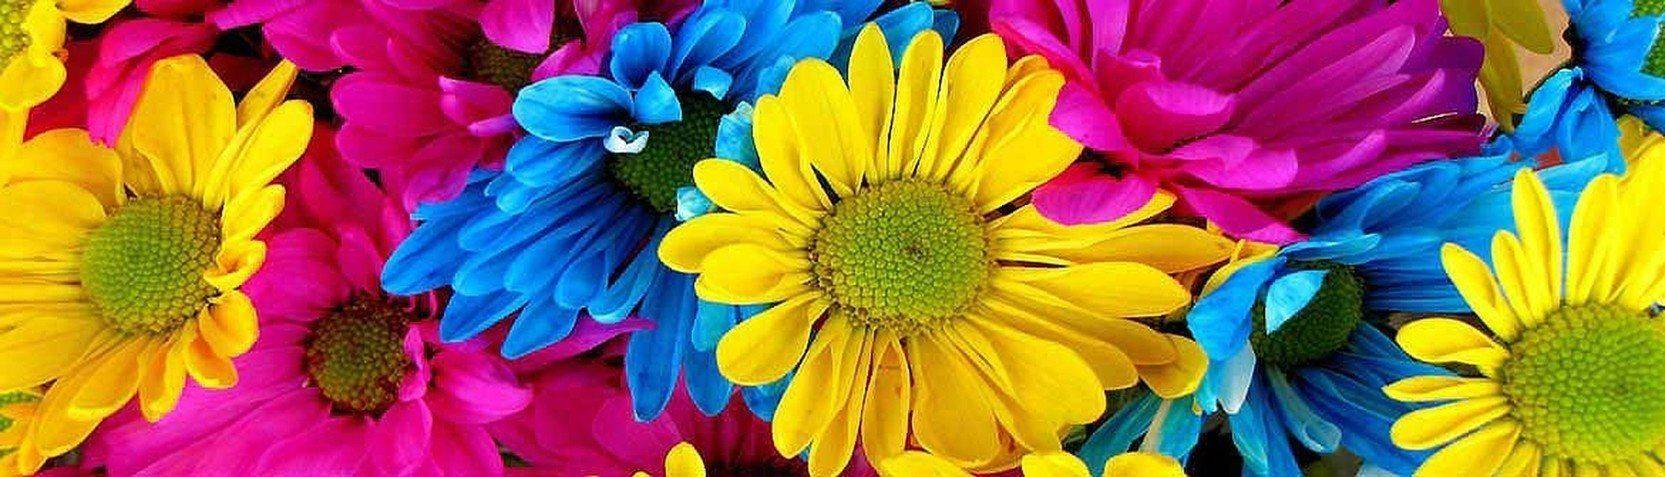 Kollektionen - Blumenbilder